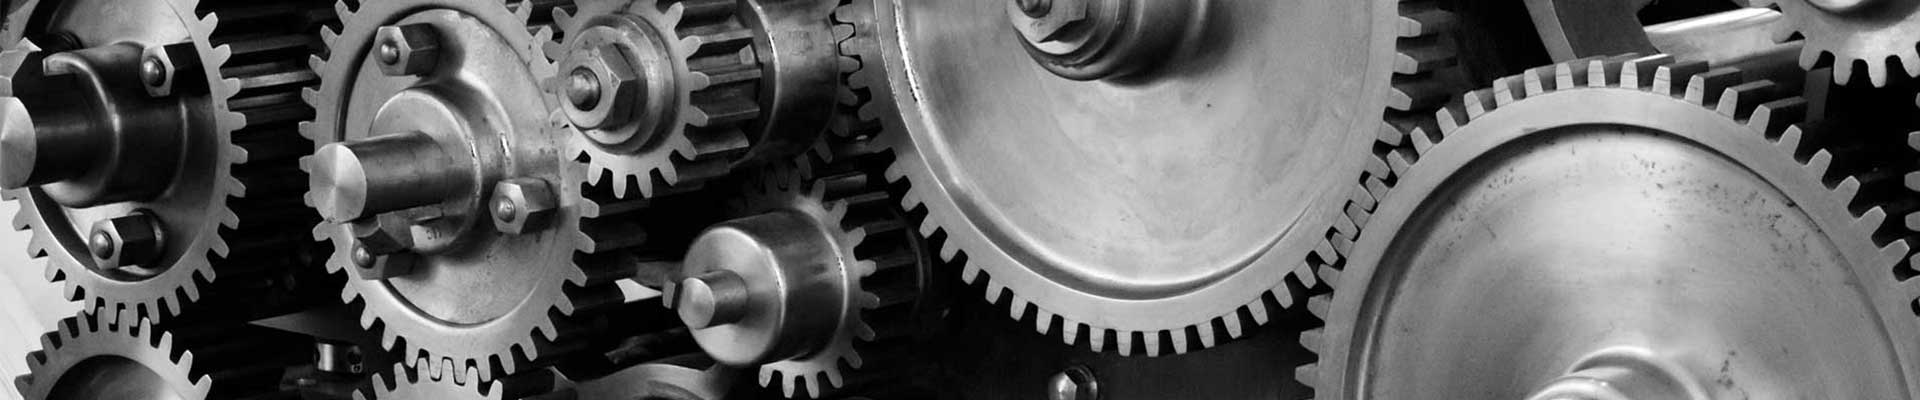 Maschinenbau Produkte